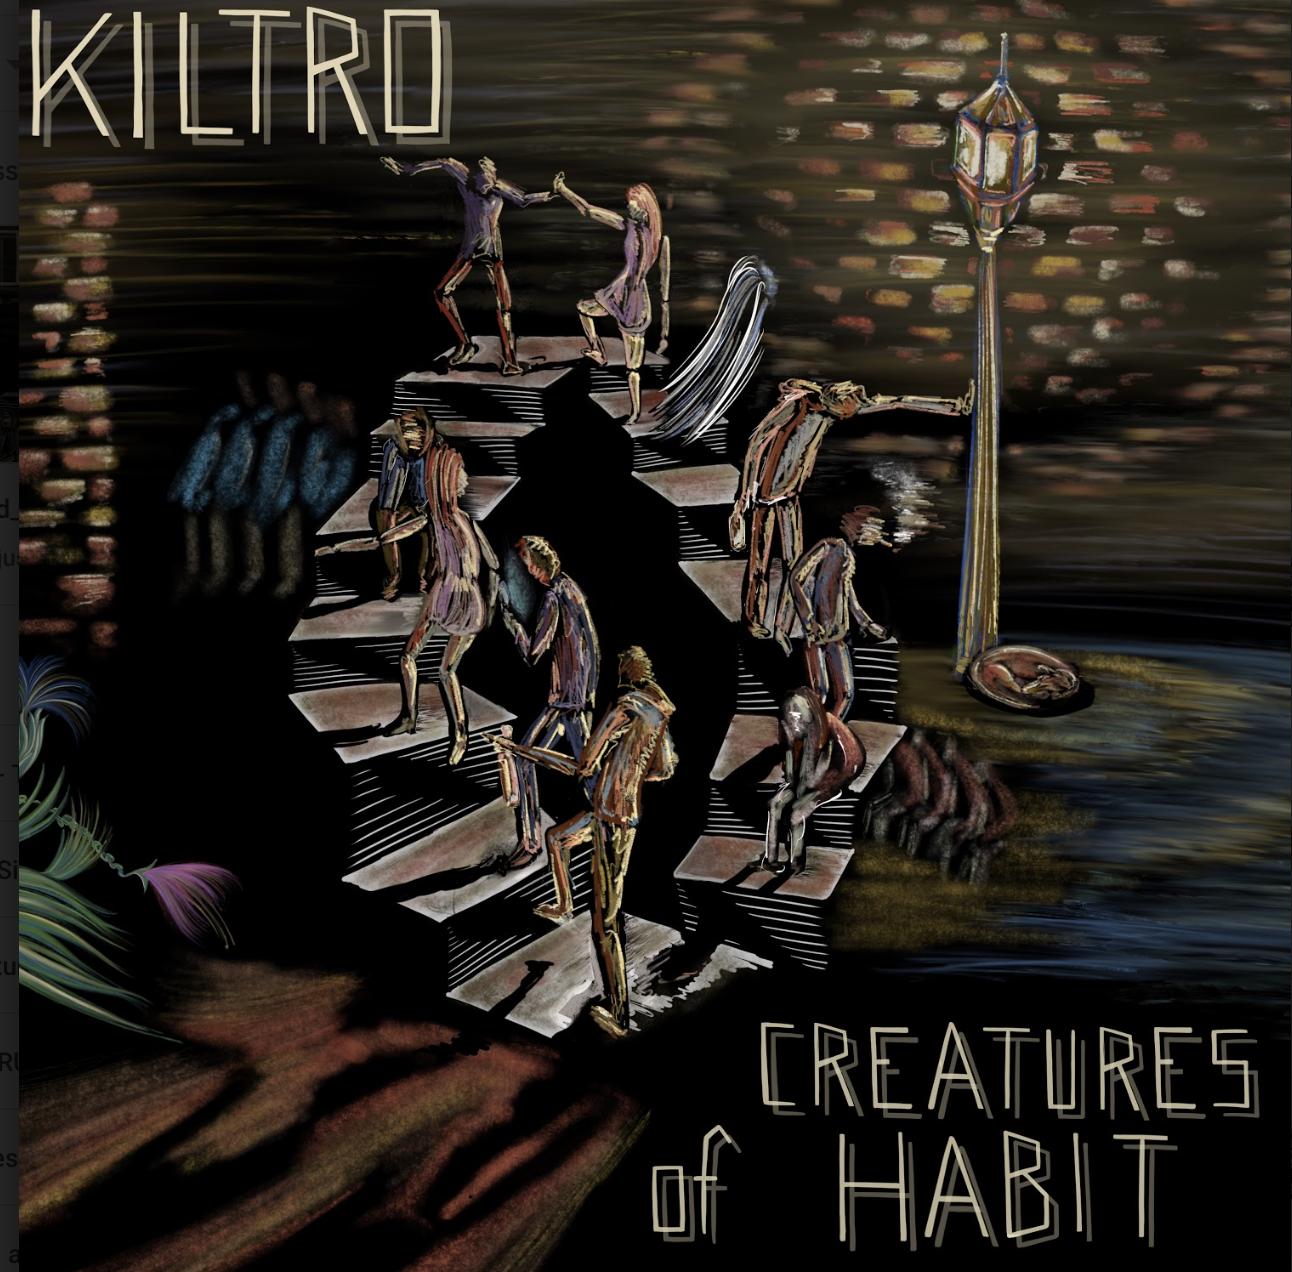 Creatures of Habit - Full Length CD